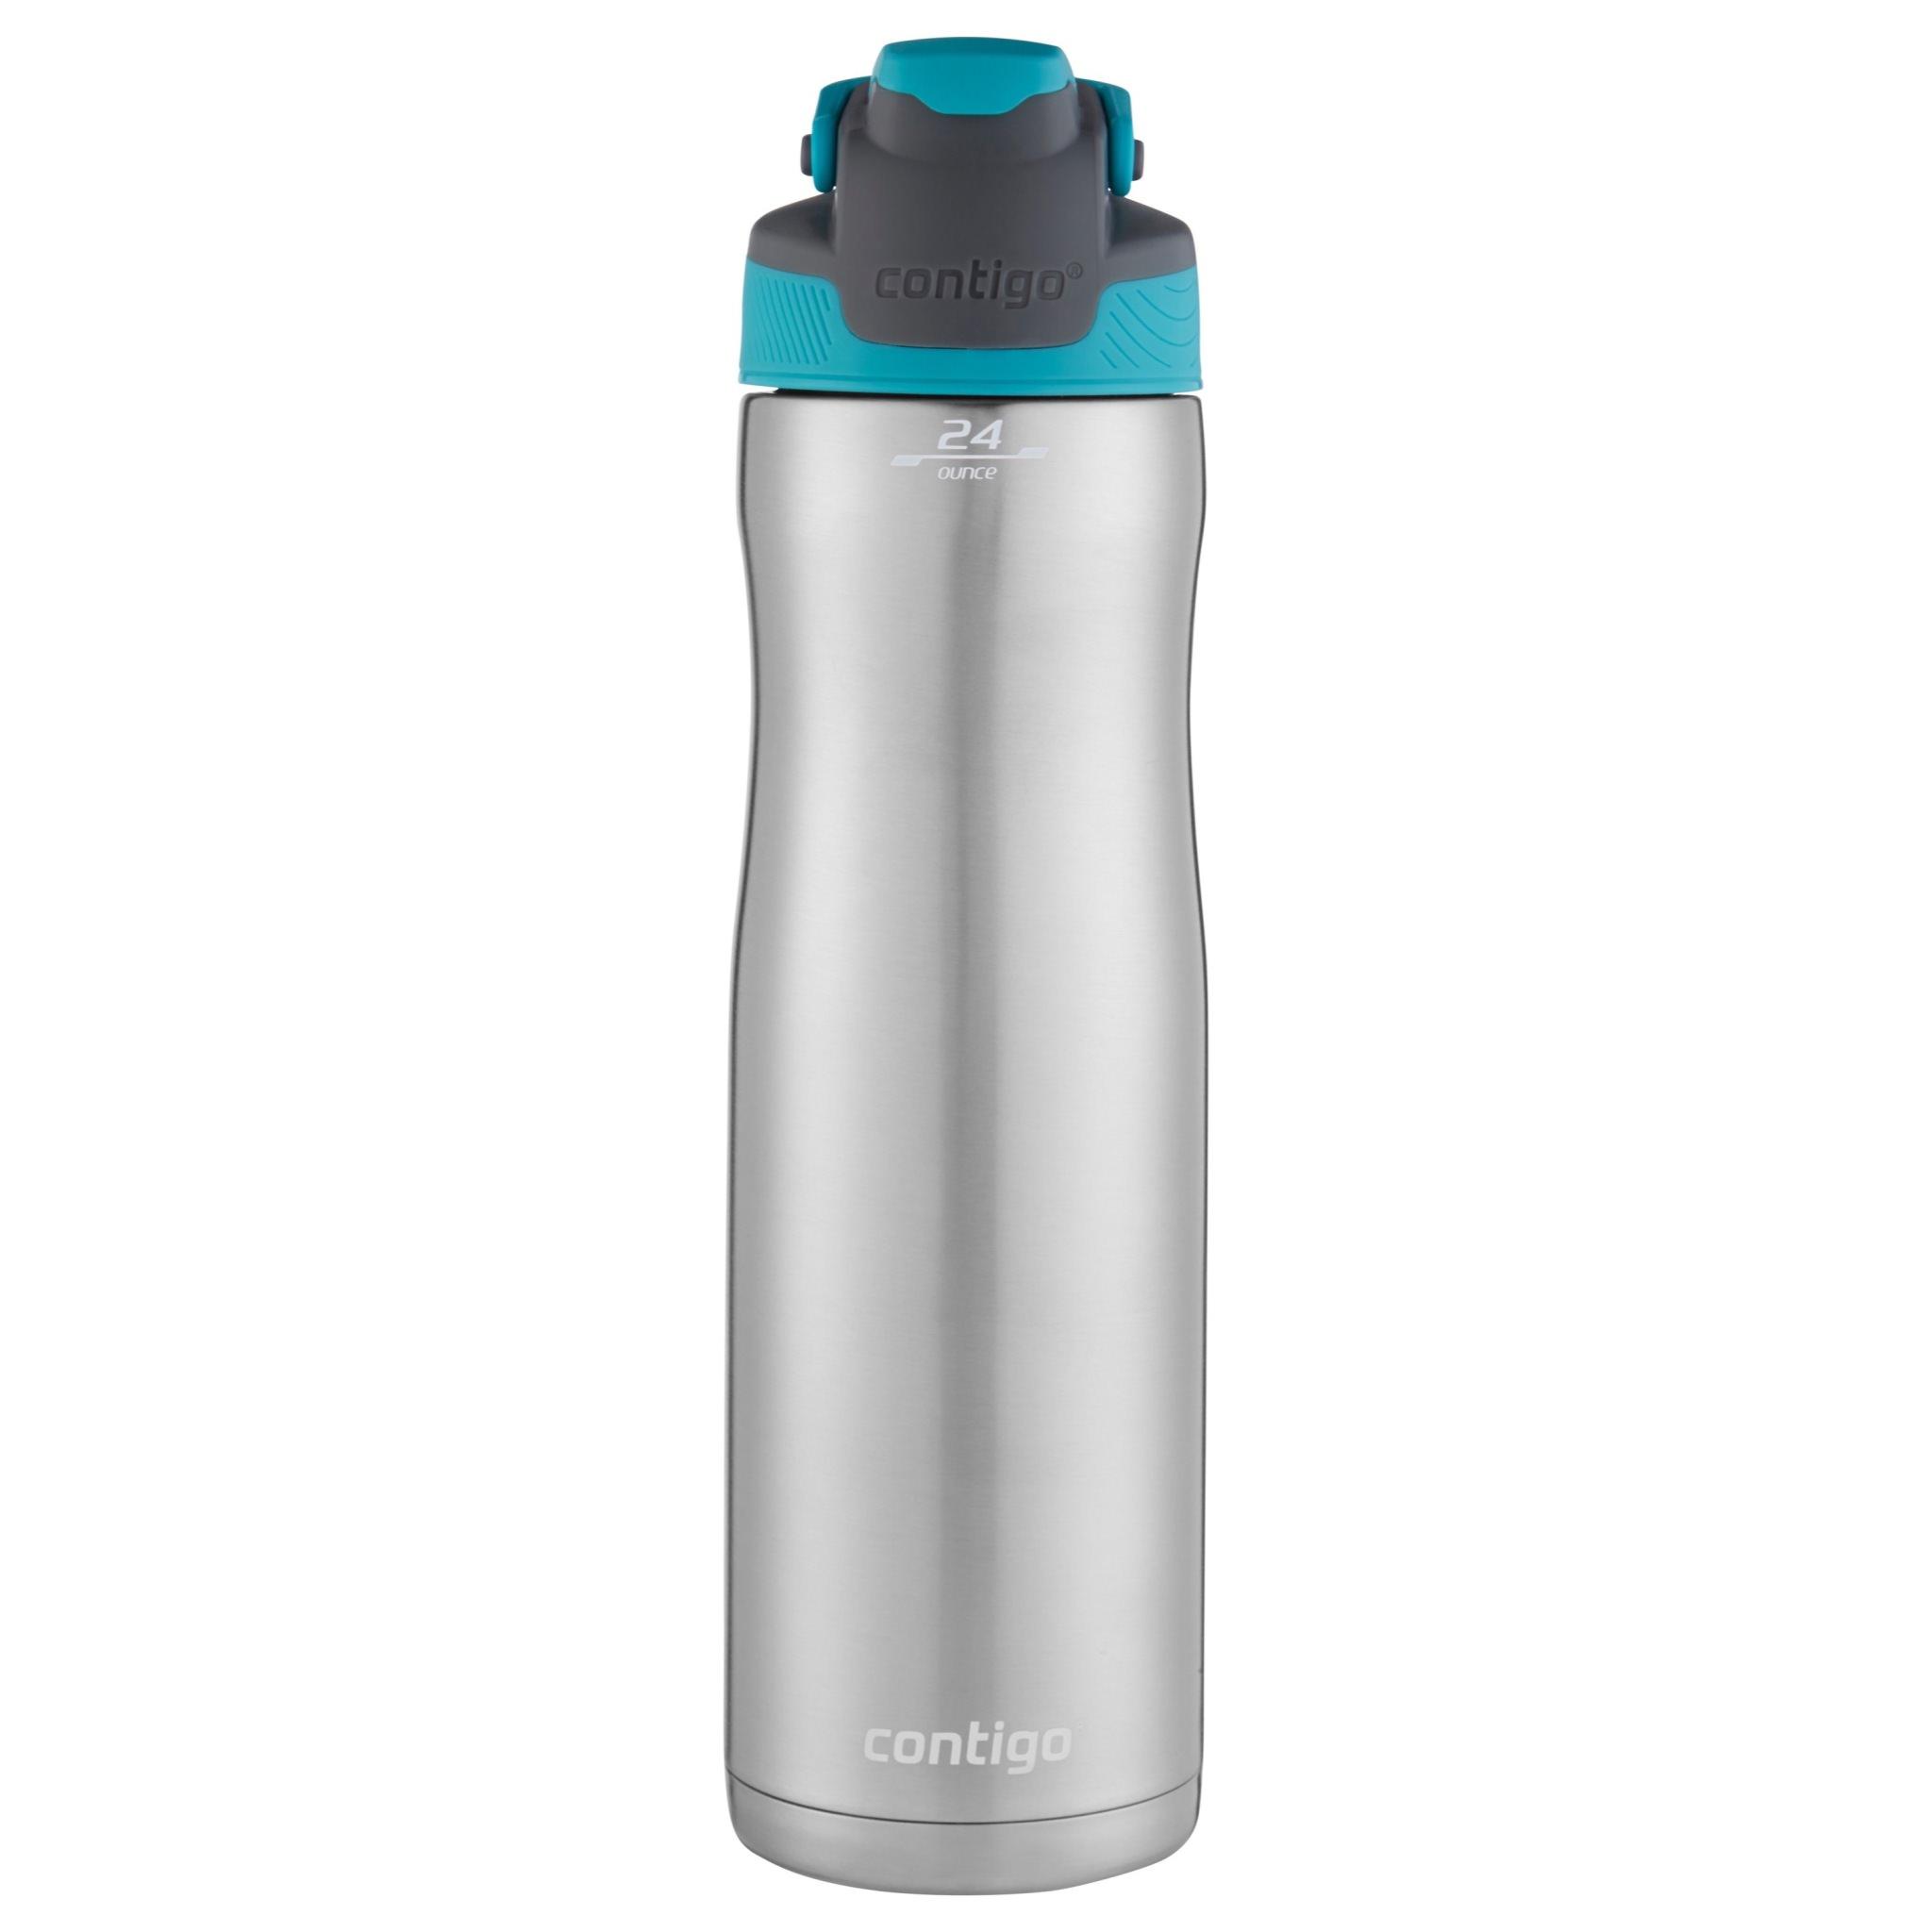 Contigo 24 Oz Autoseal Chill Stainless Steel Water Bottle, $11.88